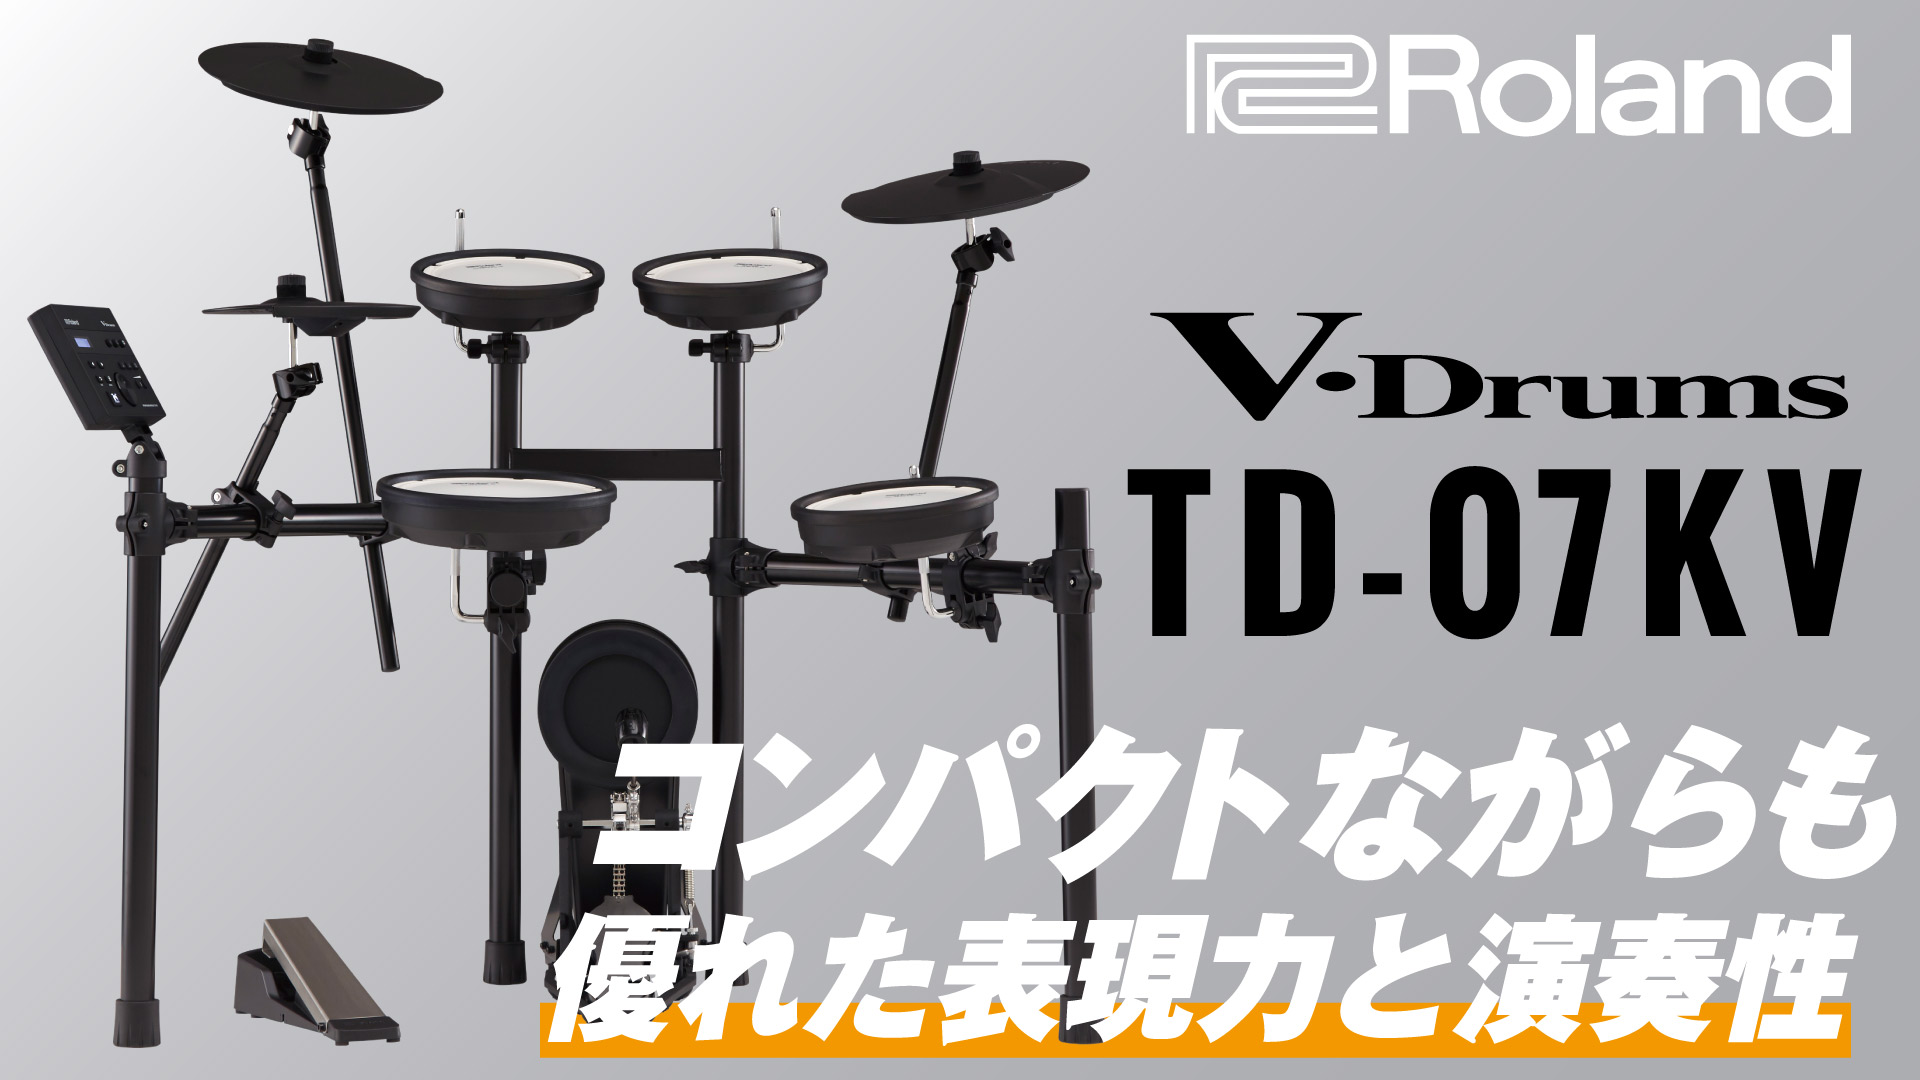 Rolandより、V-Drumsのクオリティを凝縮した新ラインナップ、「TD-07KV」が登場!